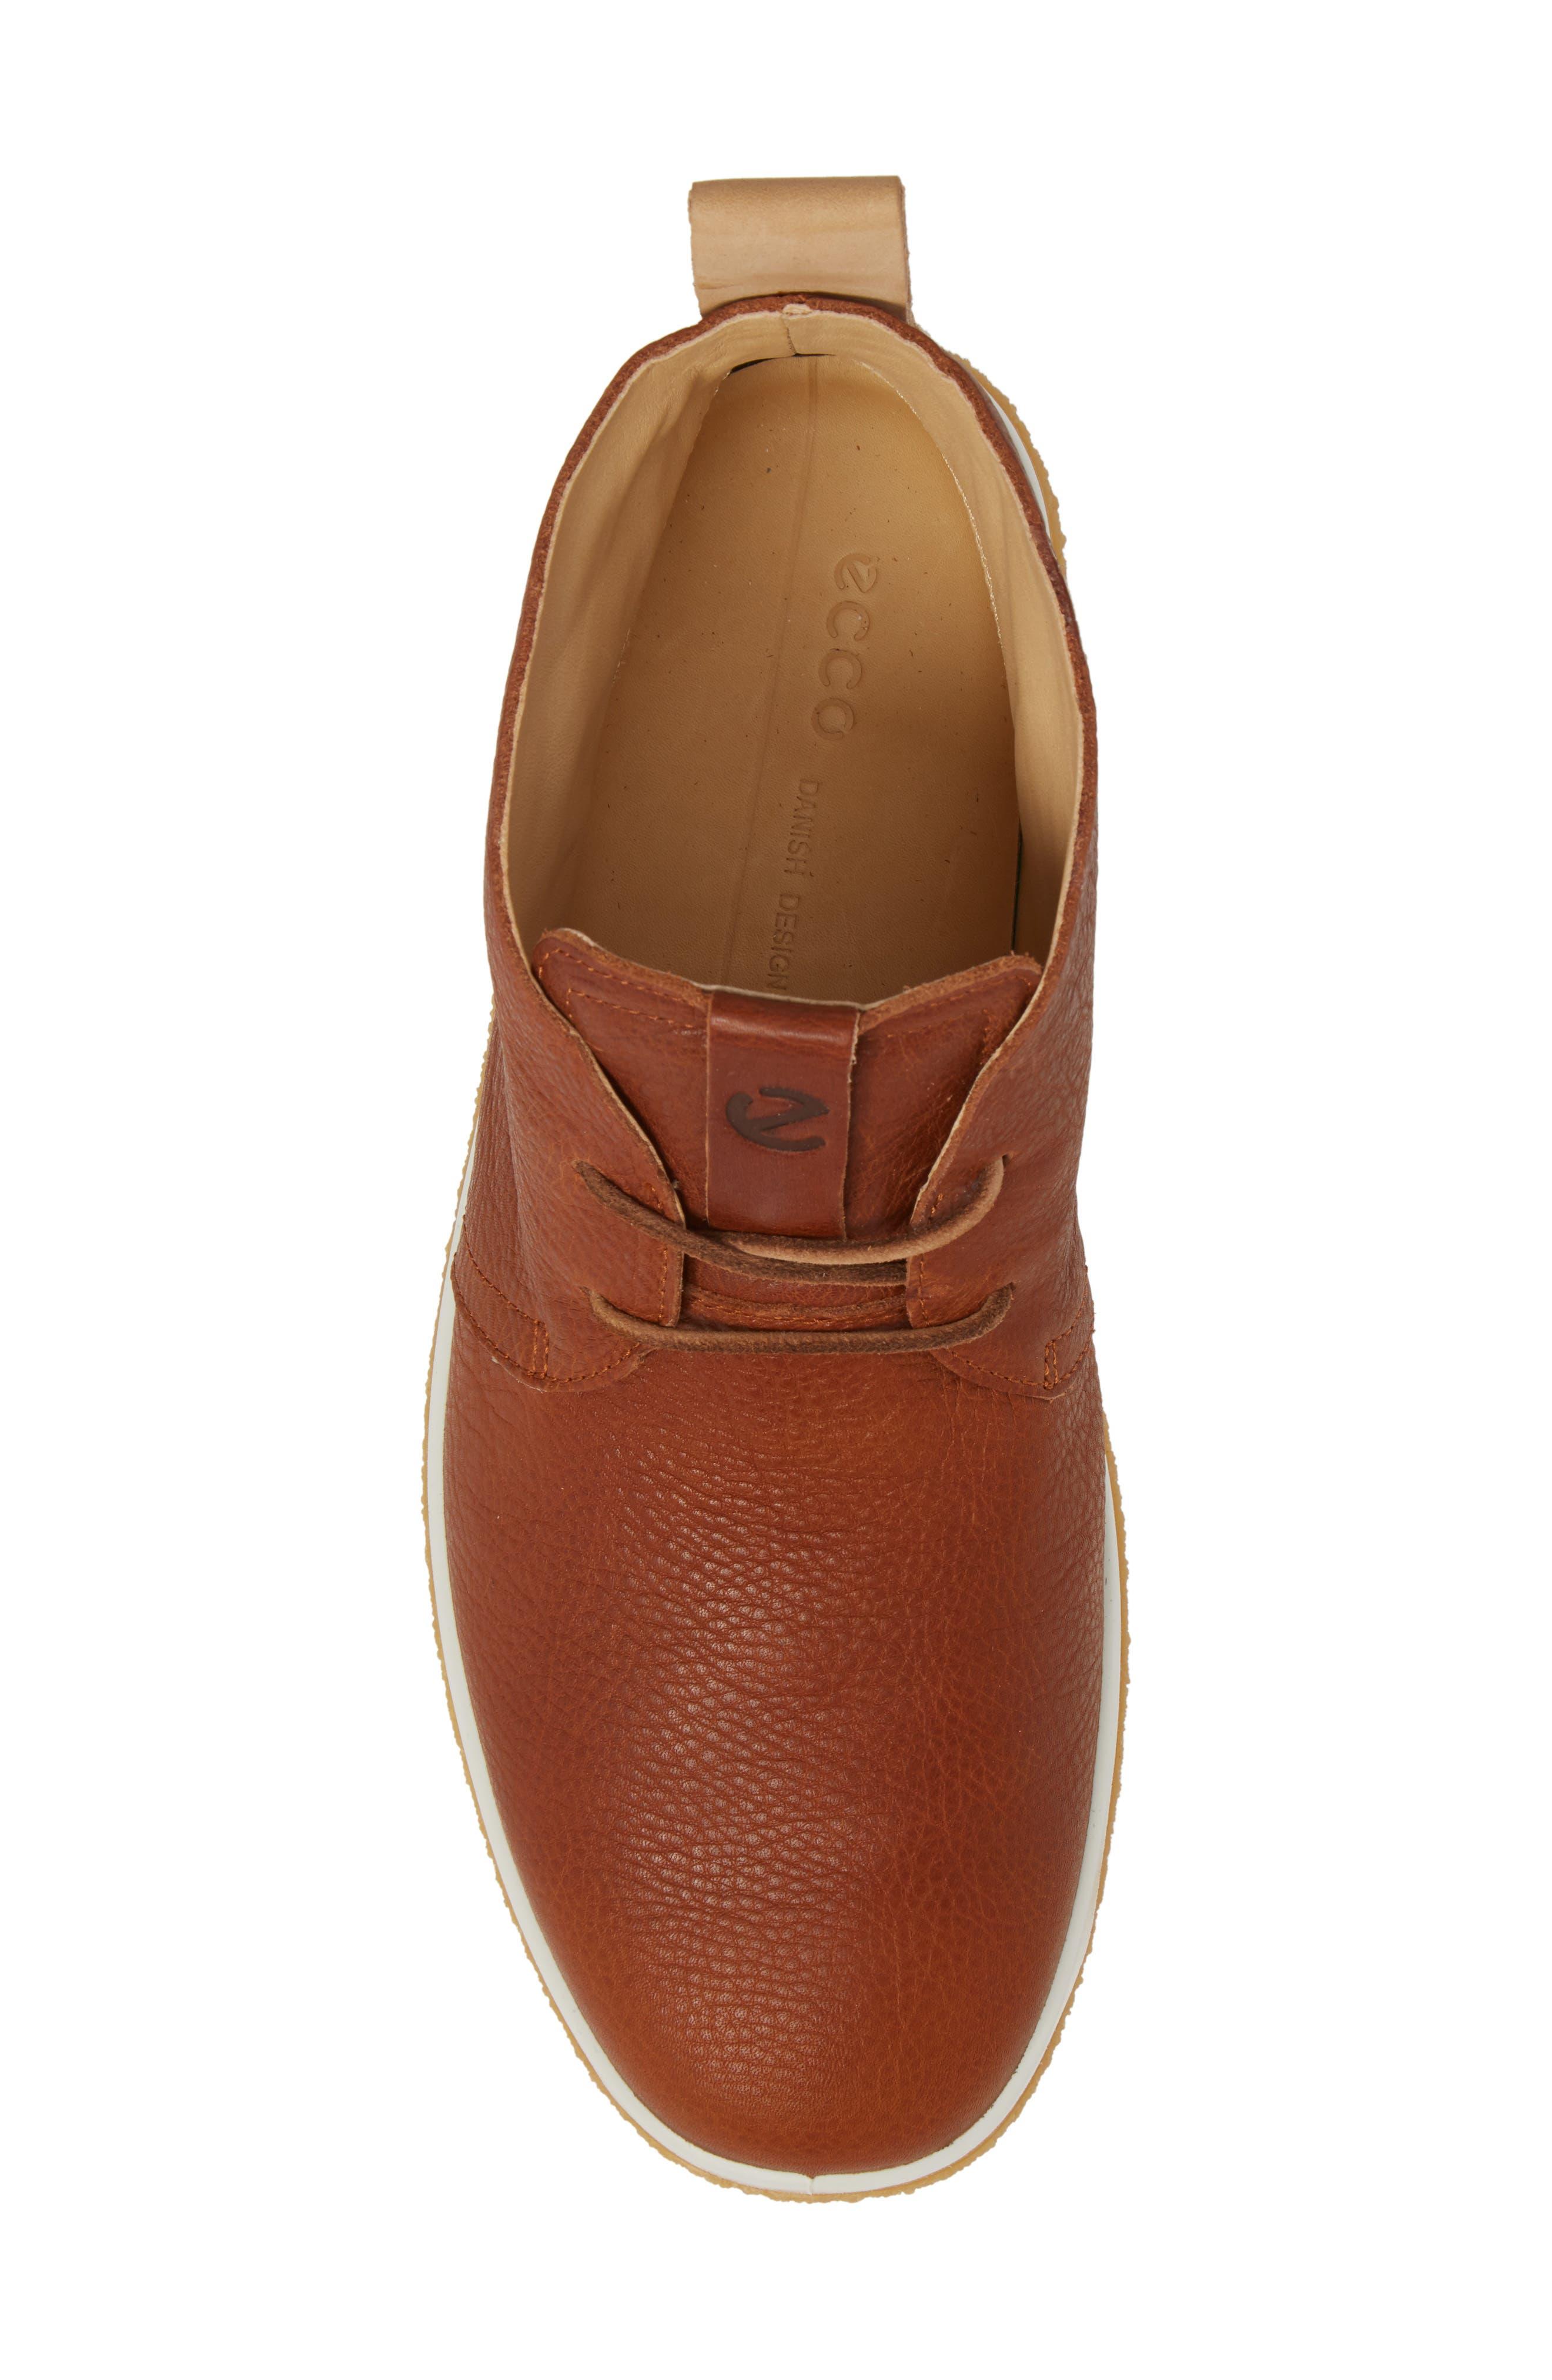 Crepetray Chukka Boot,                             Alternate thumbnail 5, color,                             Lion Leather